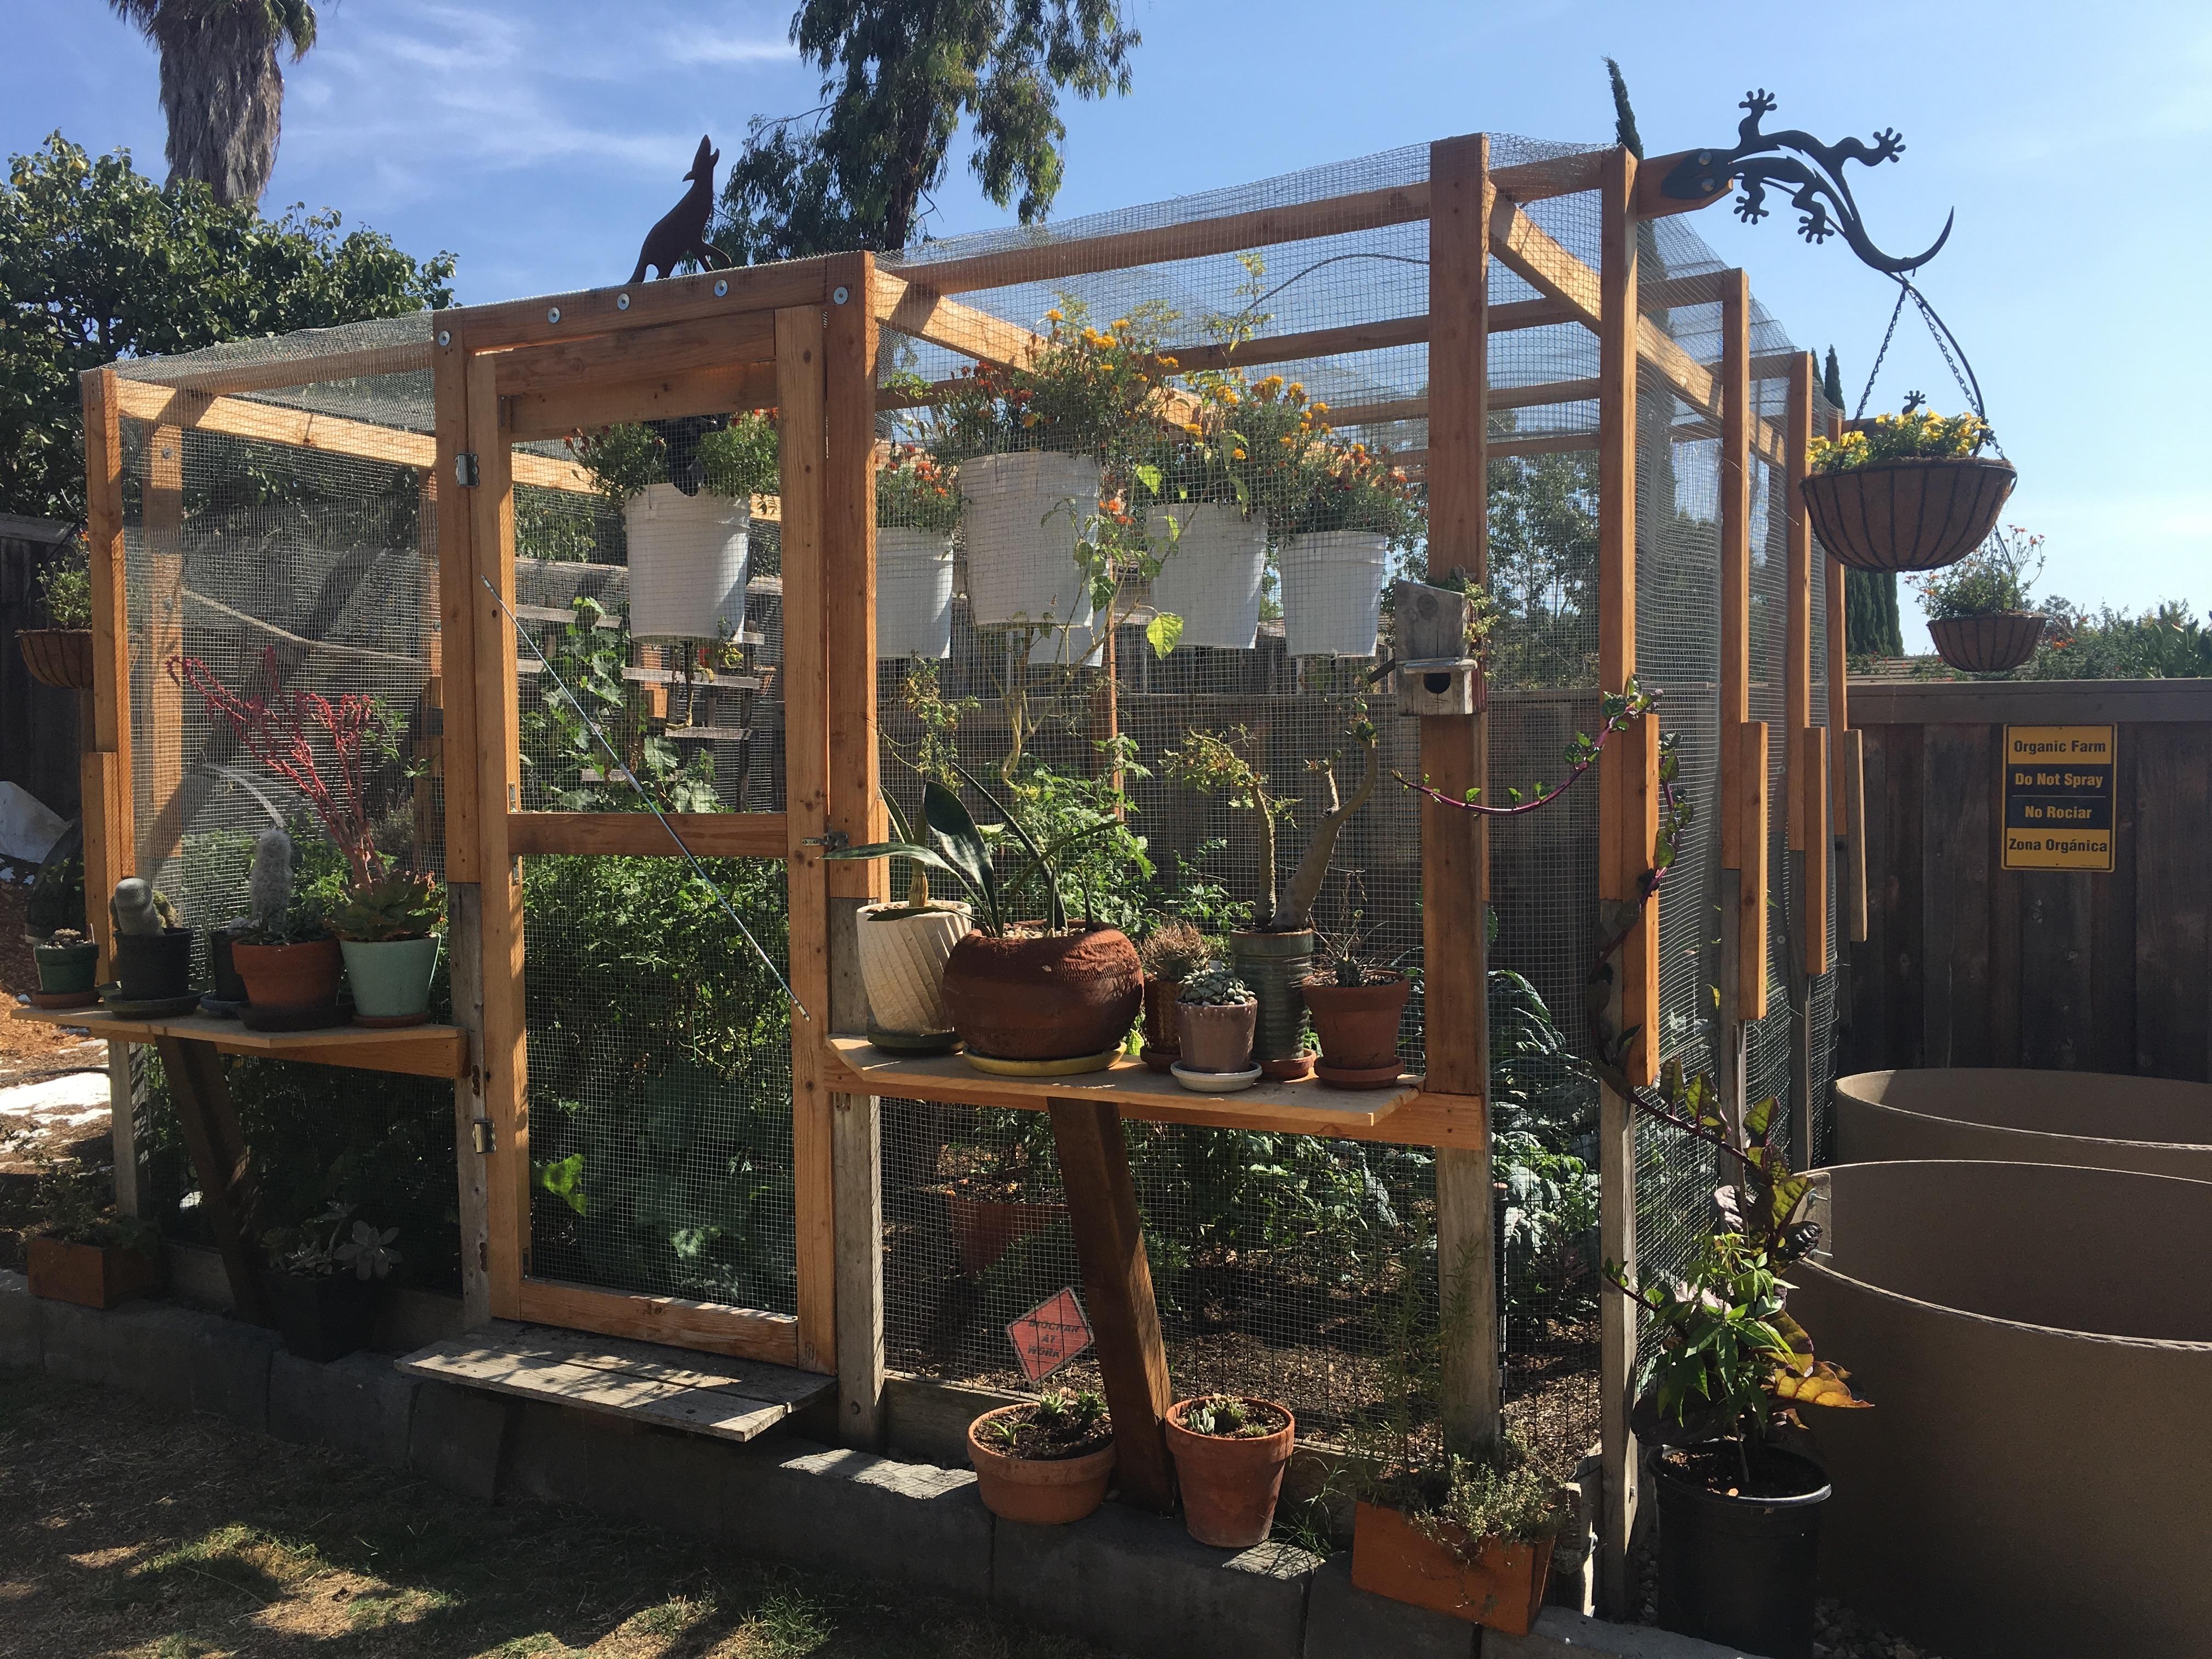 Michael Wittman garden